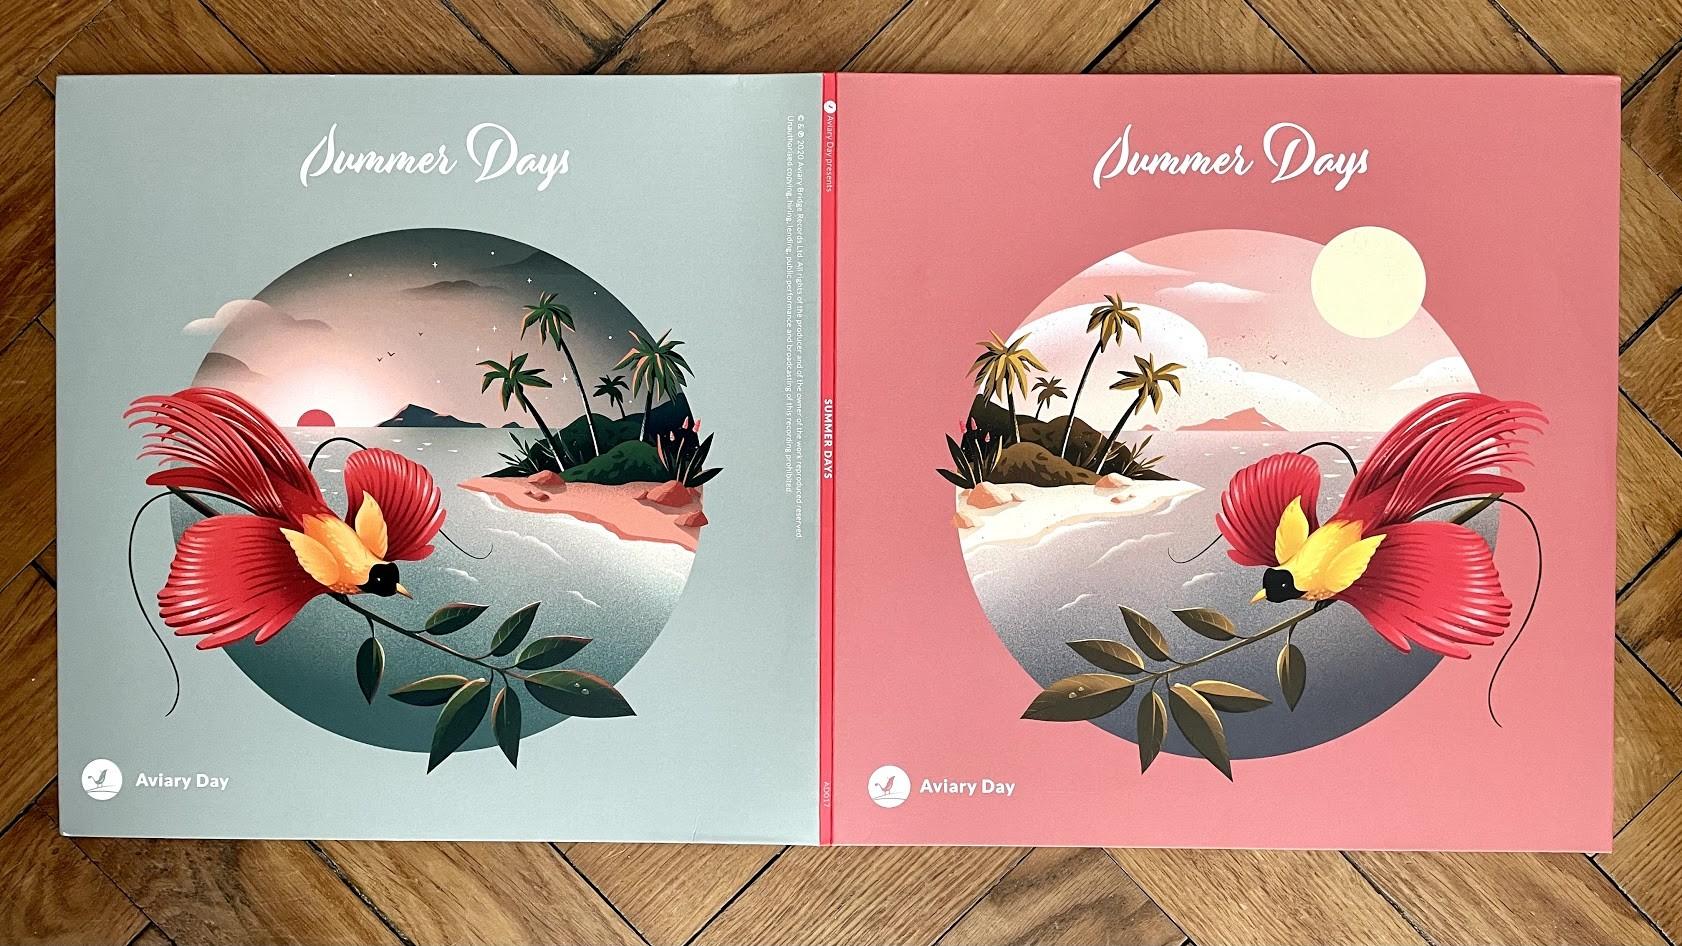 Summer Days (Aviary Day)